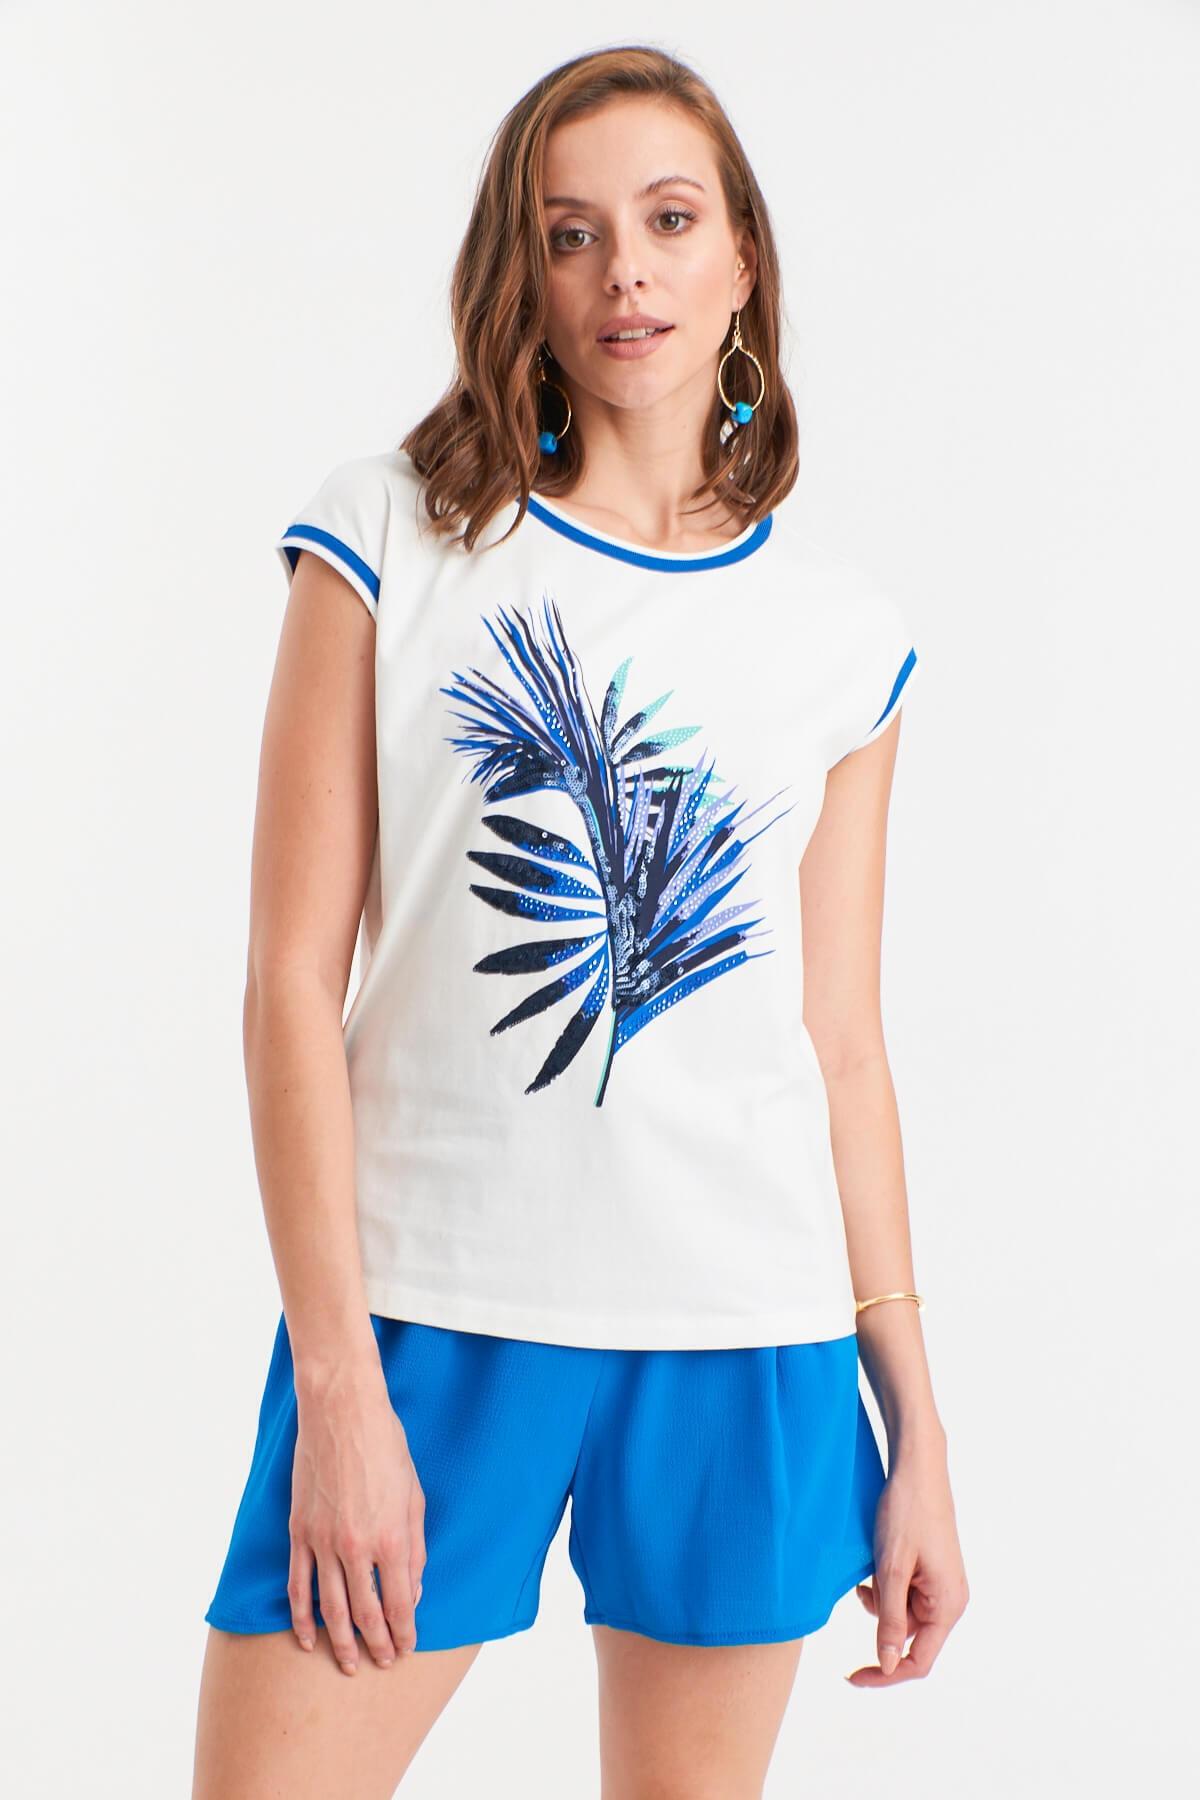 Hanna's by Hanna Darsa Yaprak Desenli T-shirt 2